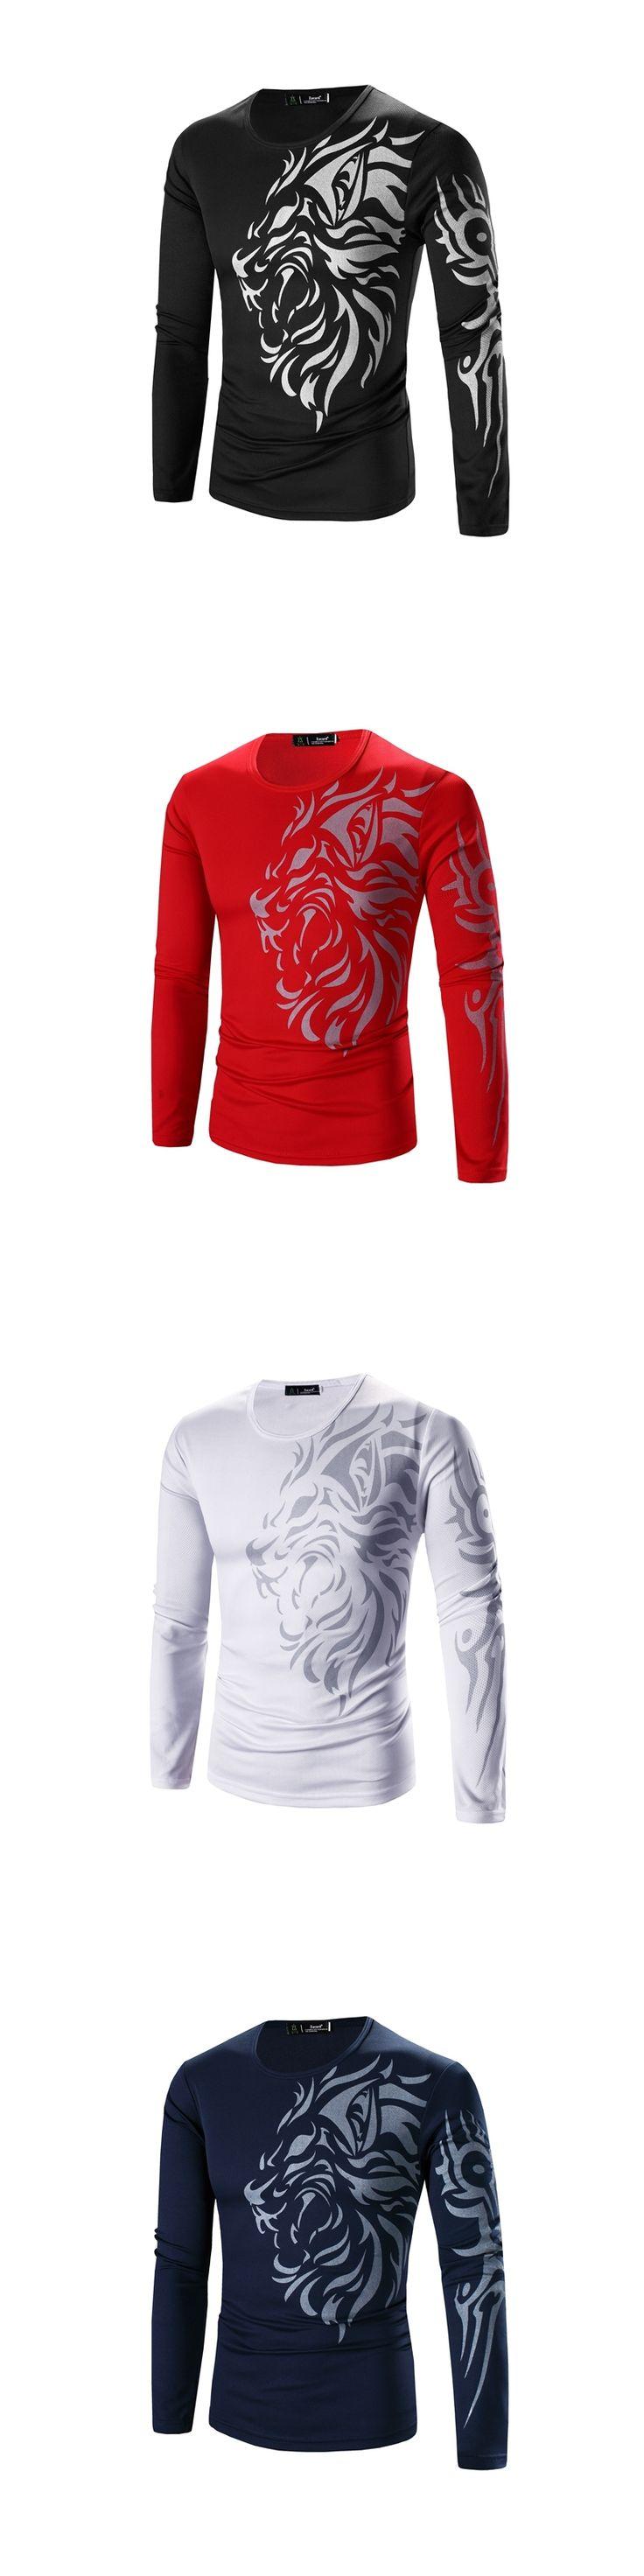 SexeMara new Fashion men's fashion Warm Hoodie Patchwork brand Hoodies men pullover assassins creed sweatshirt men NK006